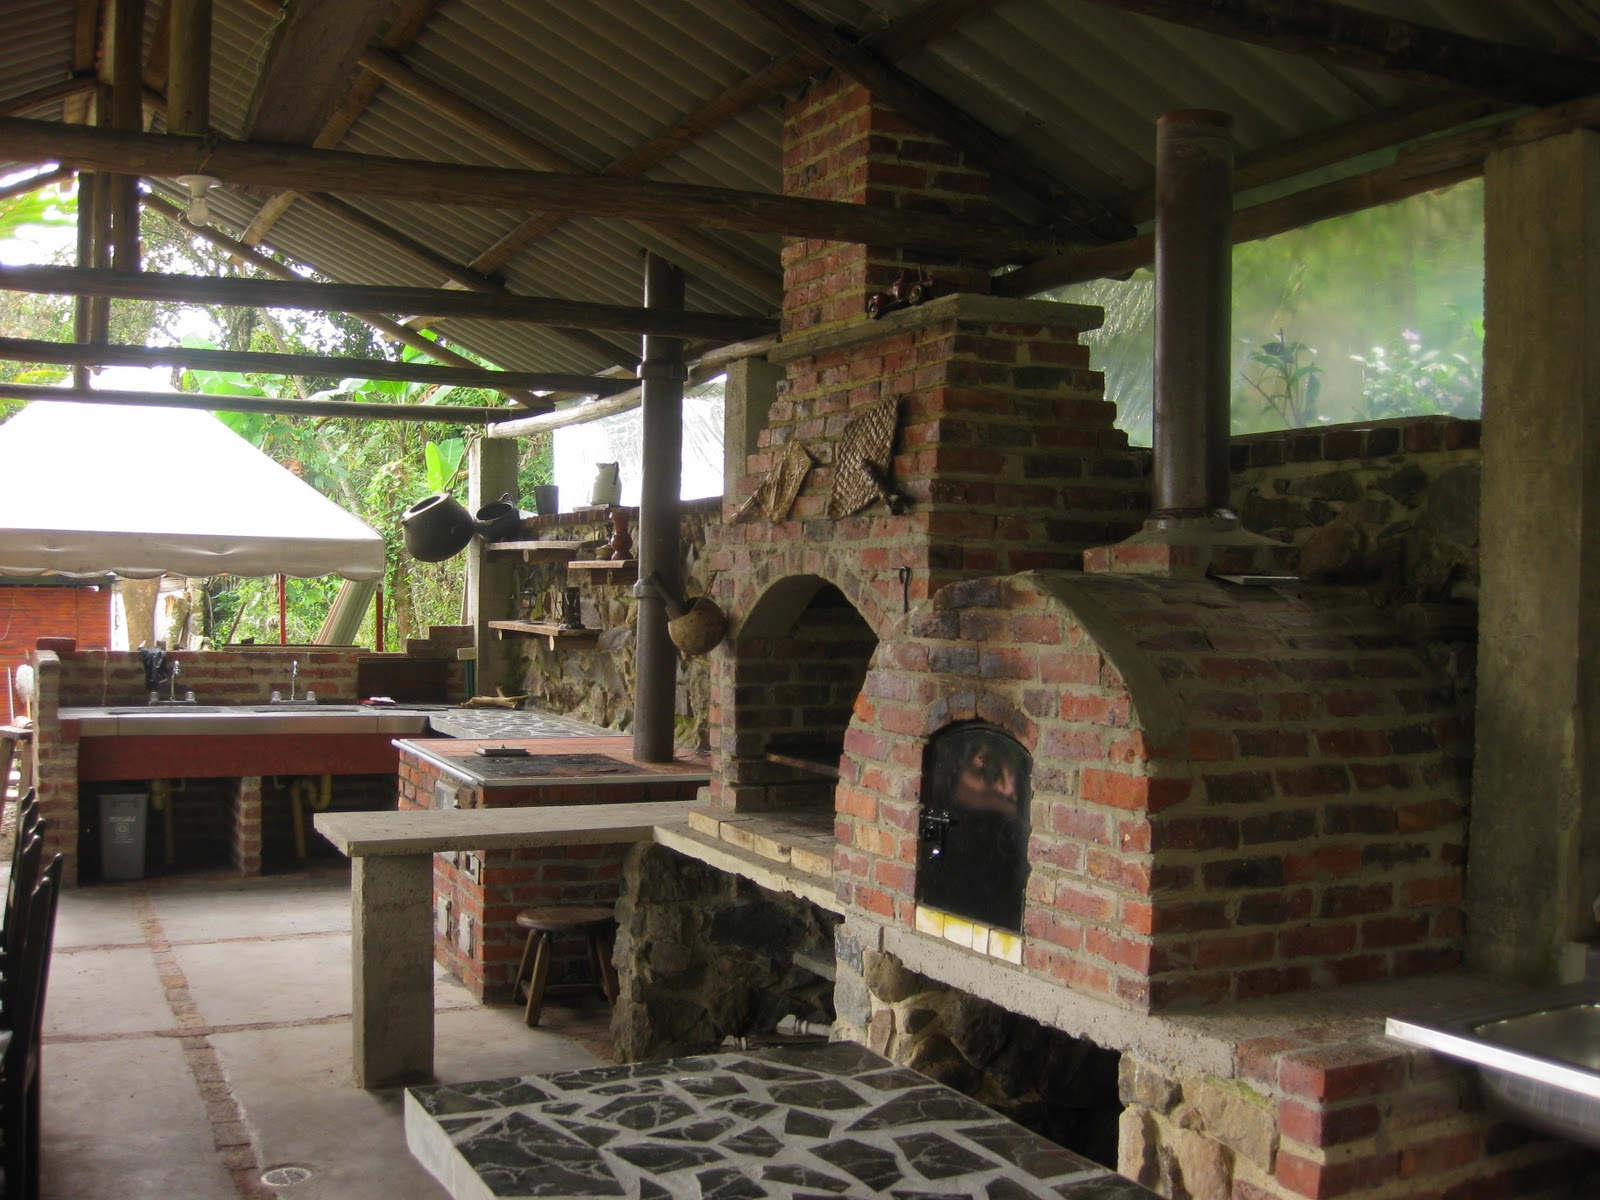 Cancha de f tbol 7 la casa del arbol san francisco cundinamarca colombia - La casa del barbecue ...